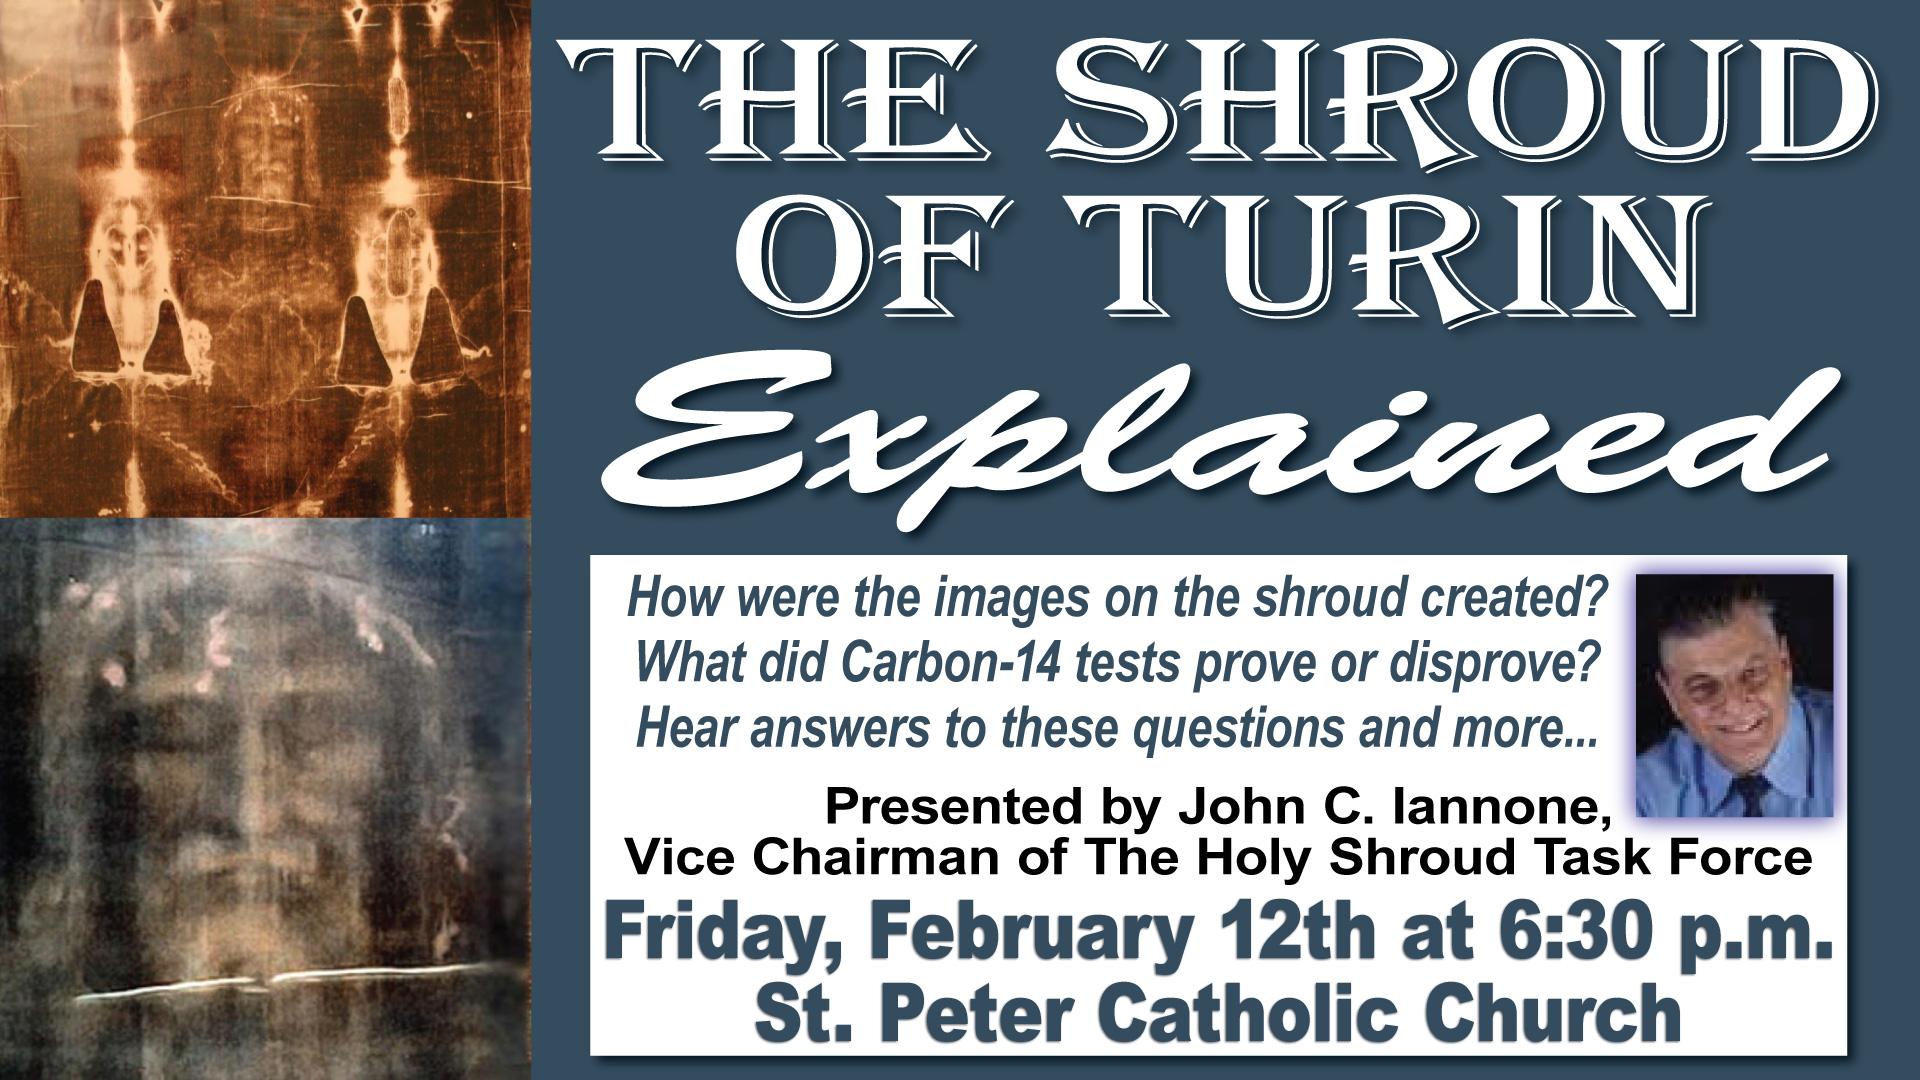 The-Shroud-of-Turin-Explained